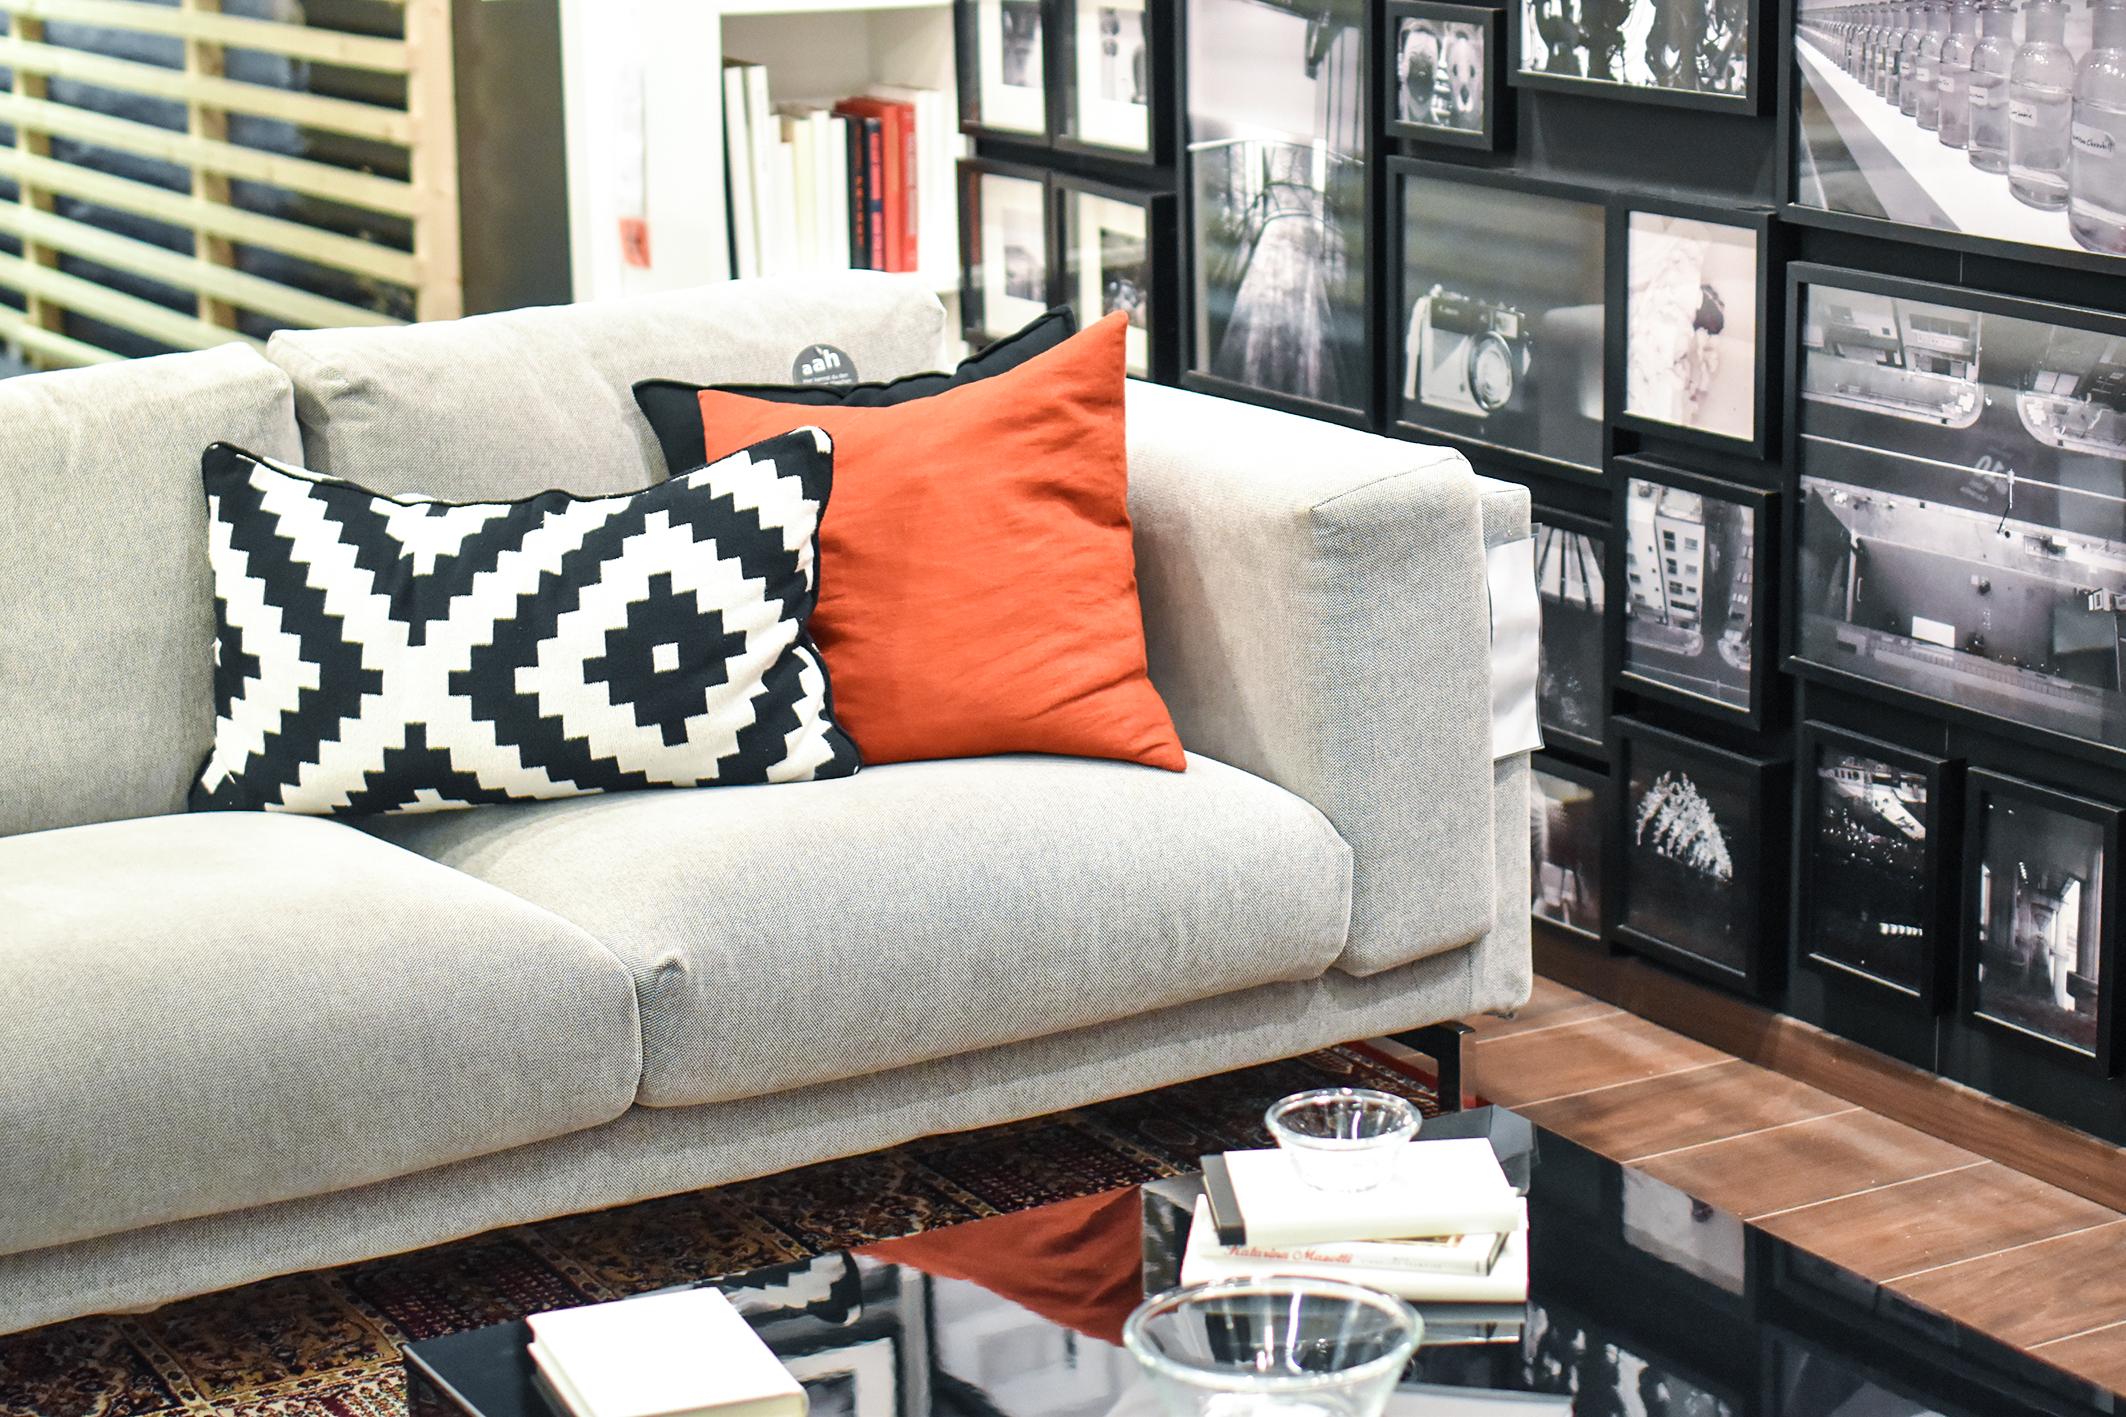 date mal anders mit badoo. Black Bedroom Furniture Sets. Home Design Ideas